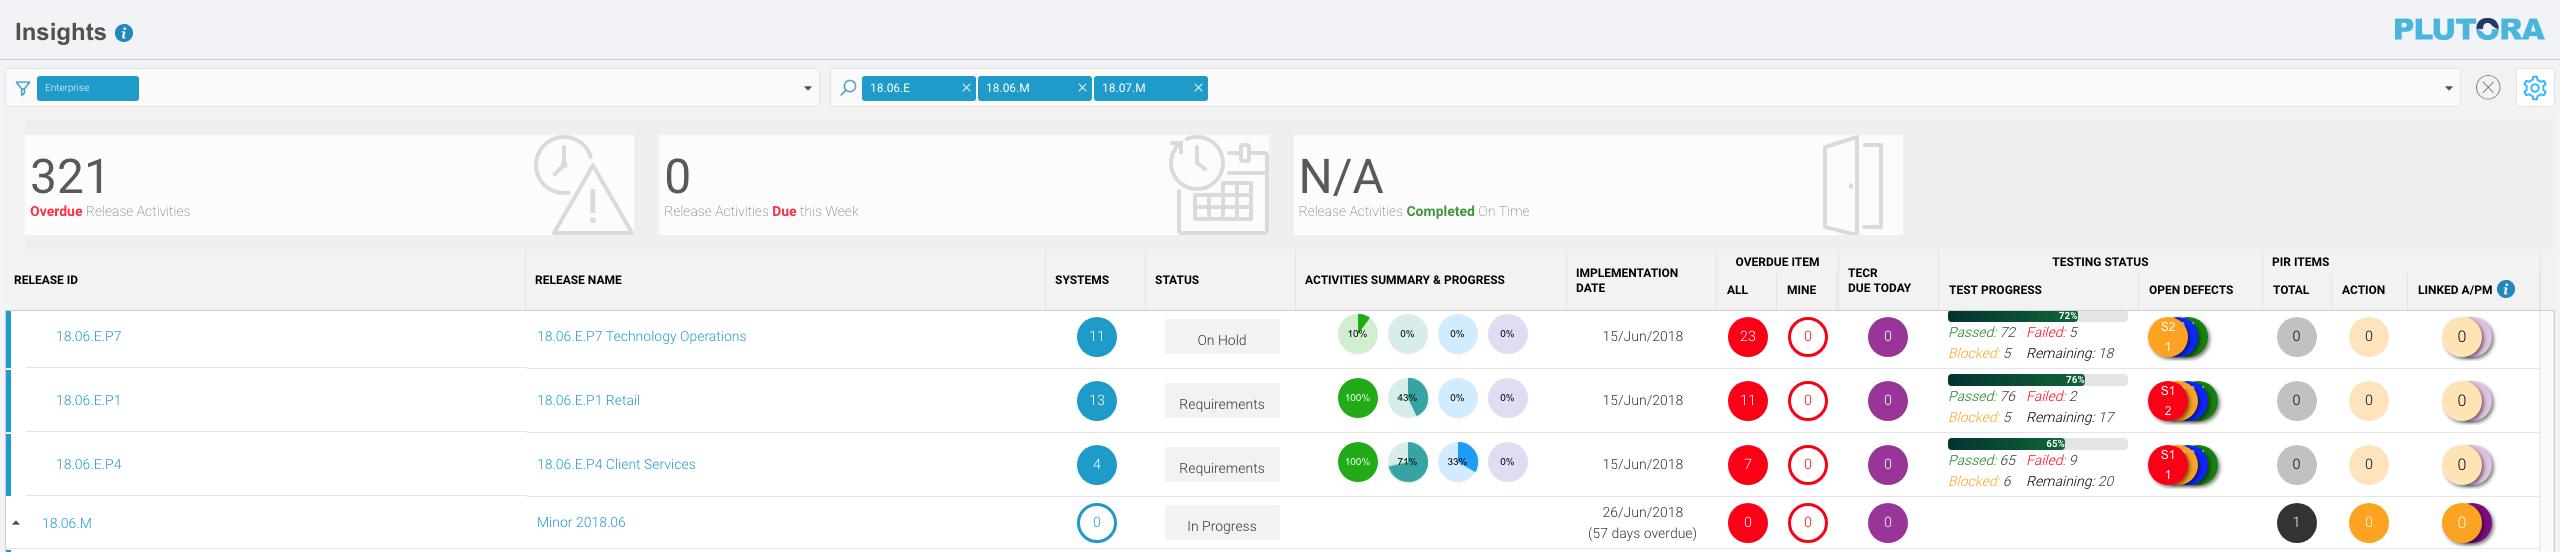 Manage Insights Dashboard | Plutora Knowledge Base